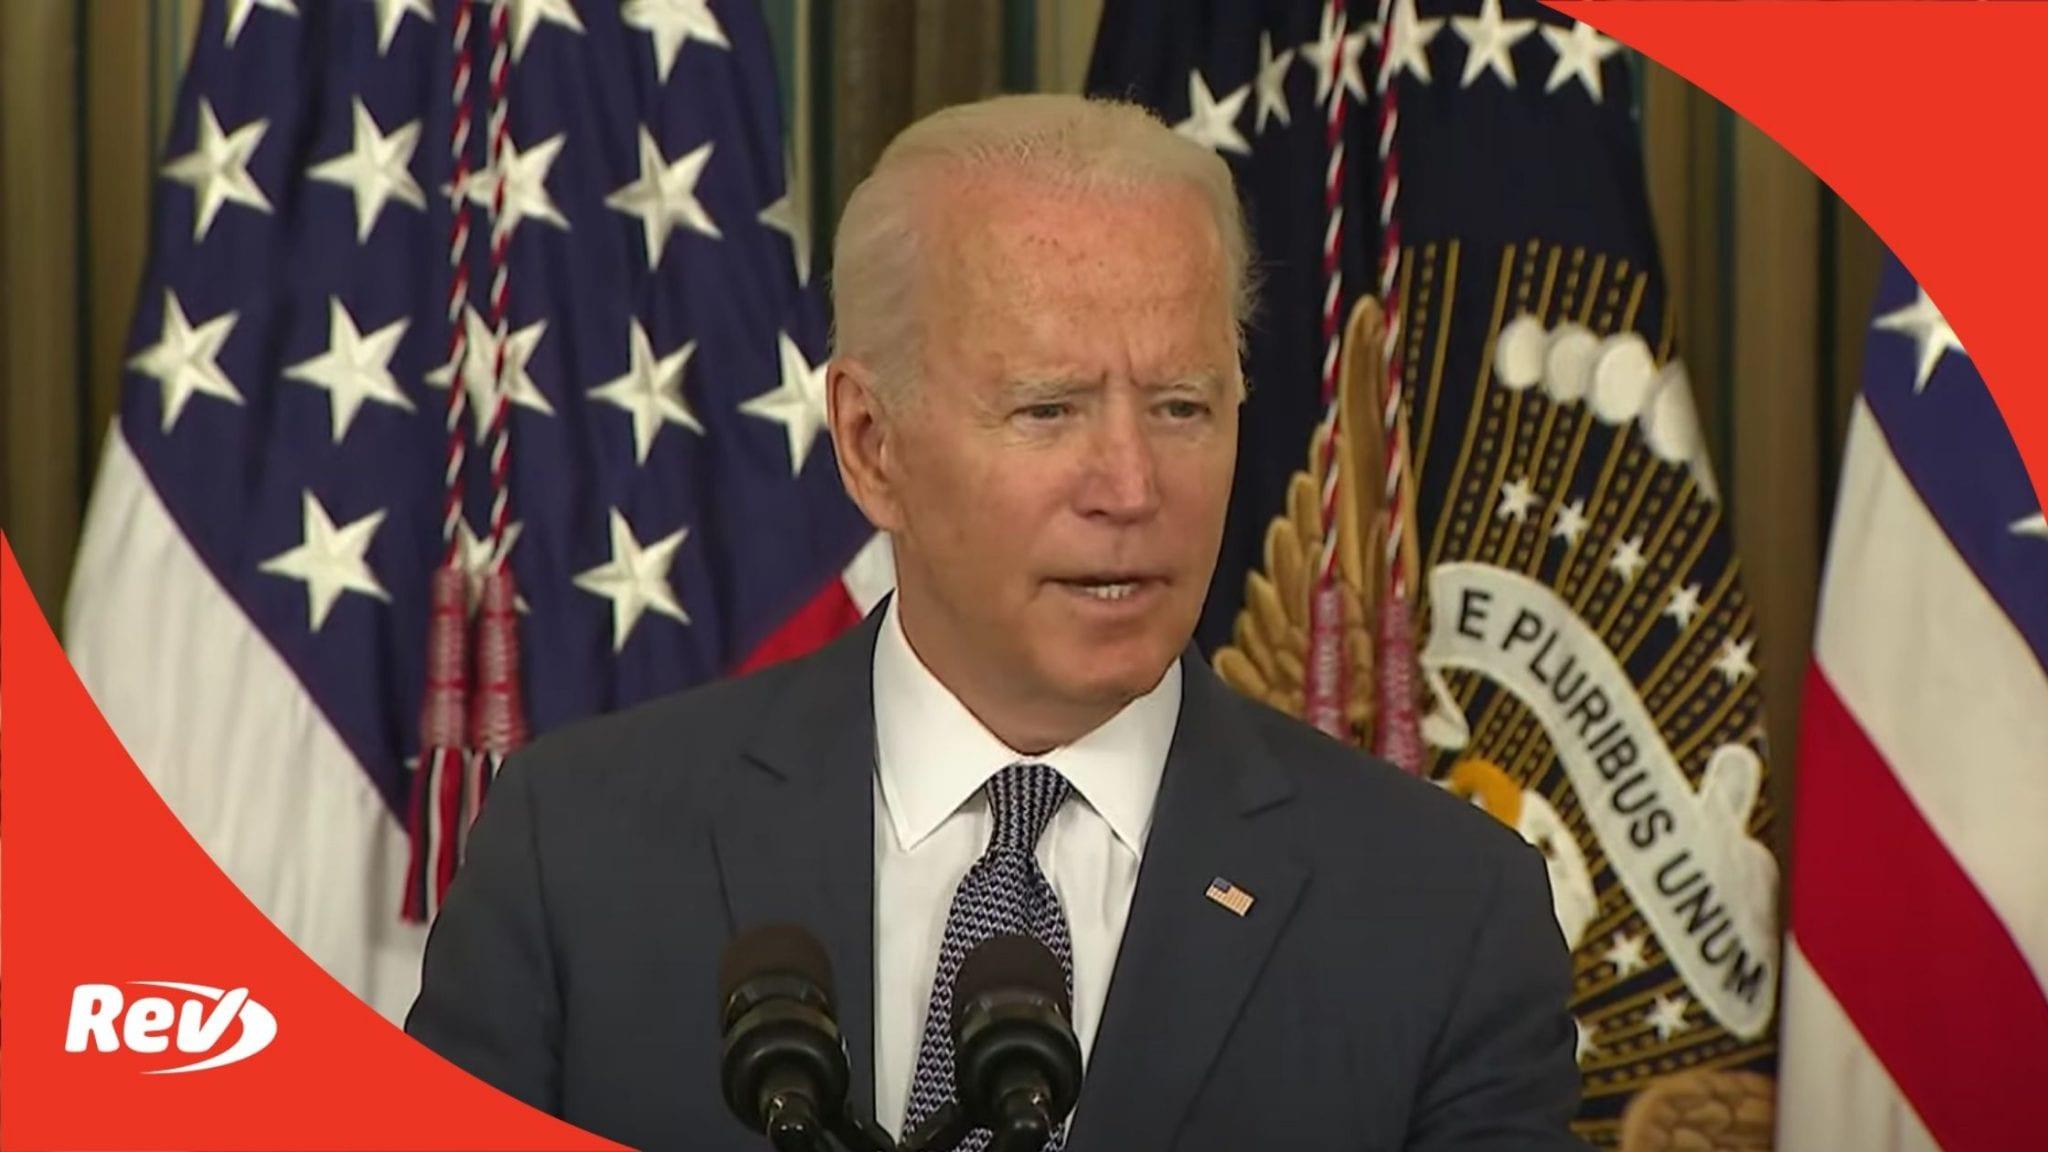 Joe Biden Signs Executive Order Promoting Competition in U.S. Economy Speech Transcript